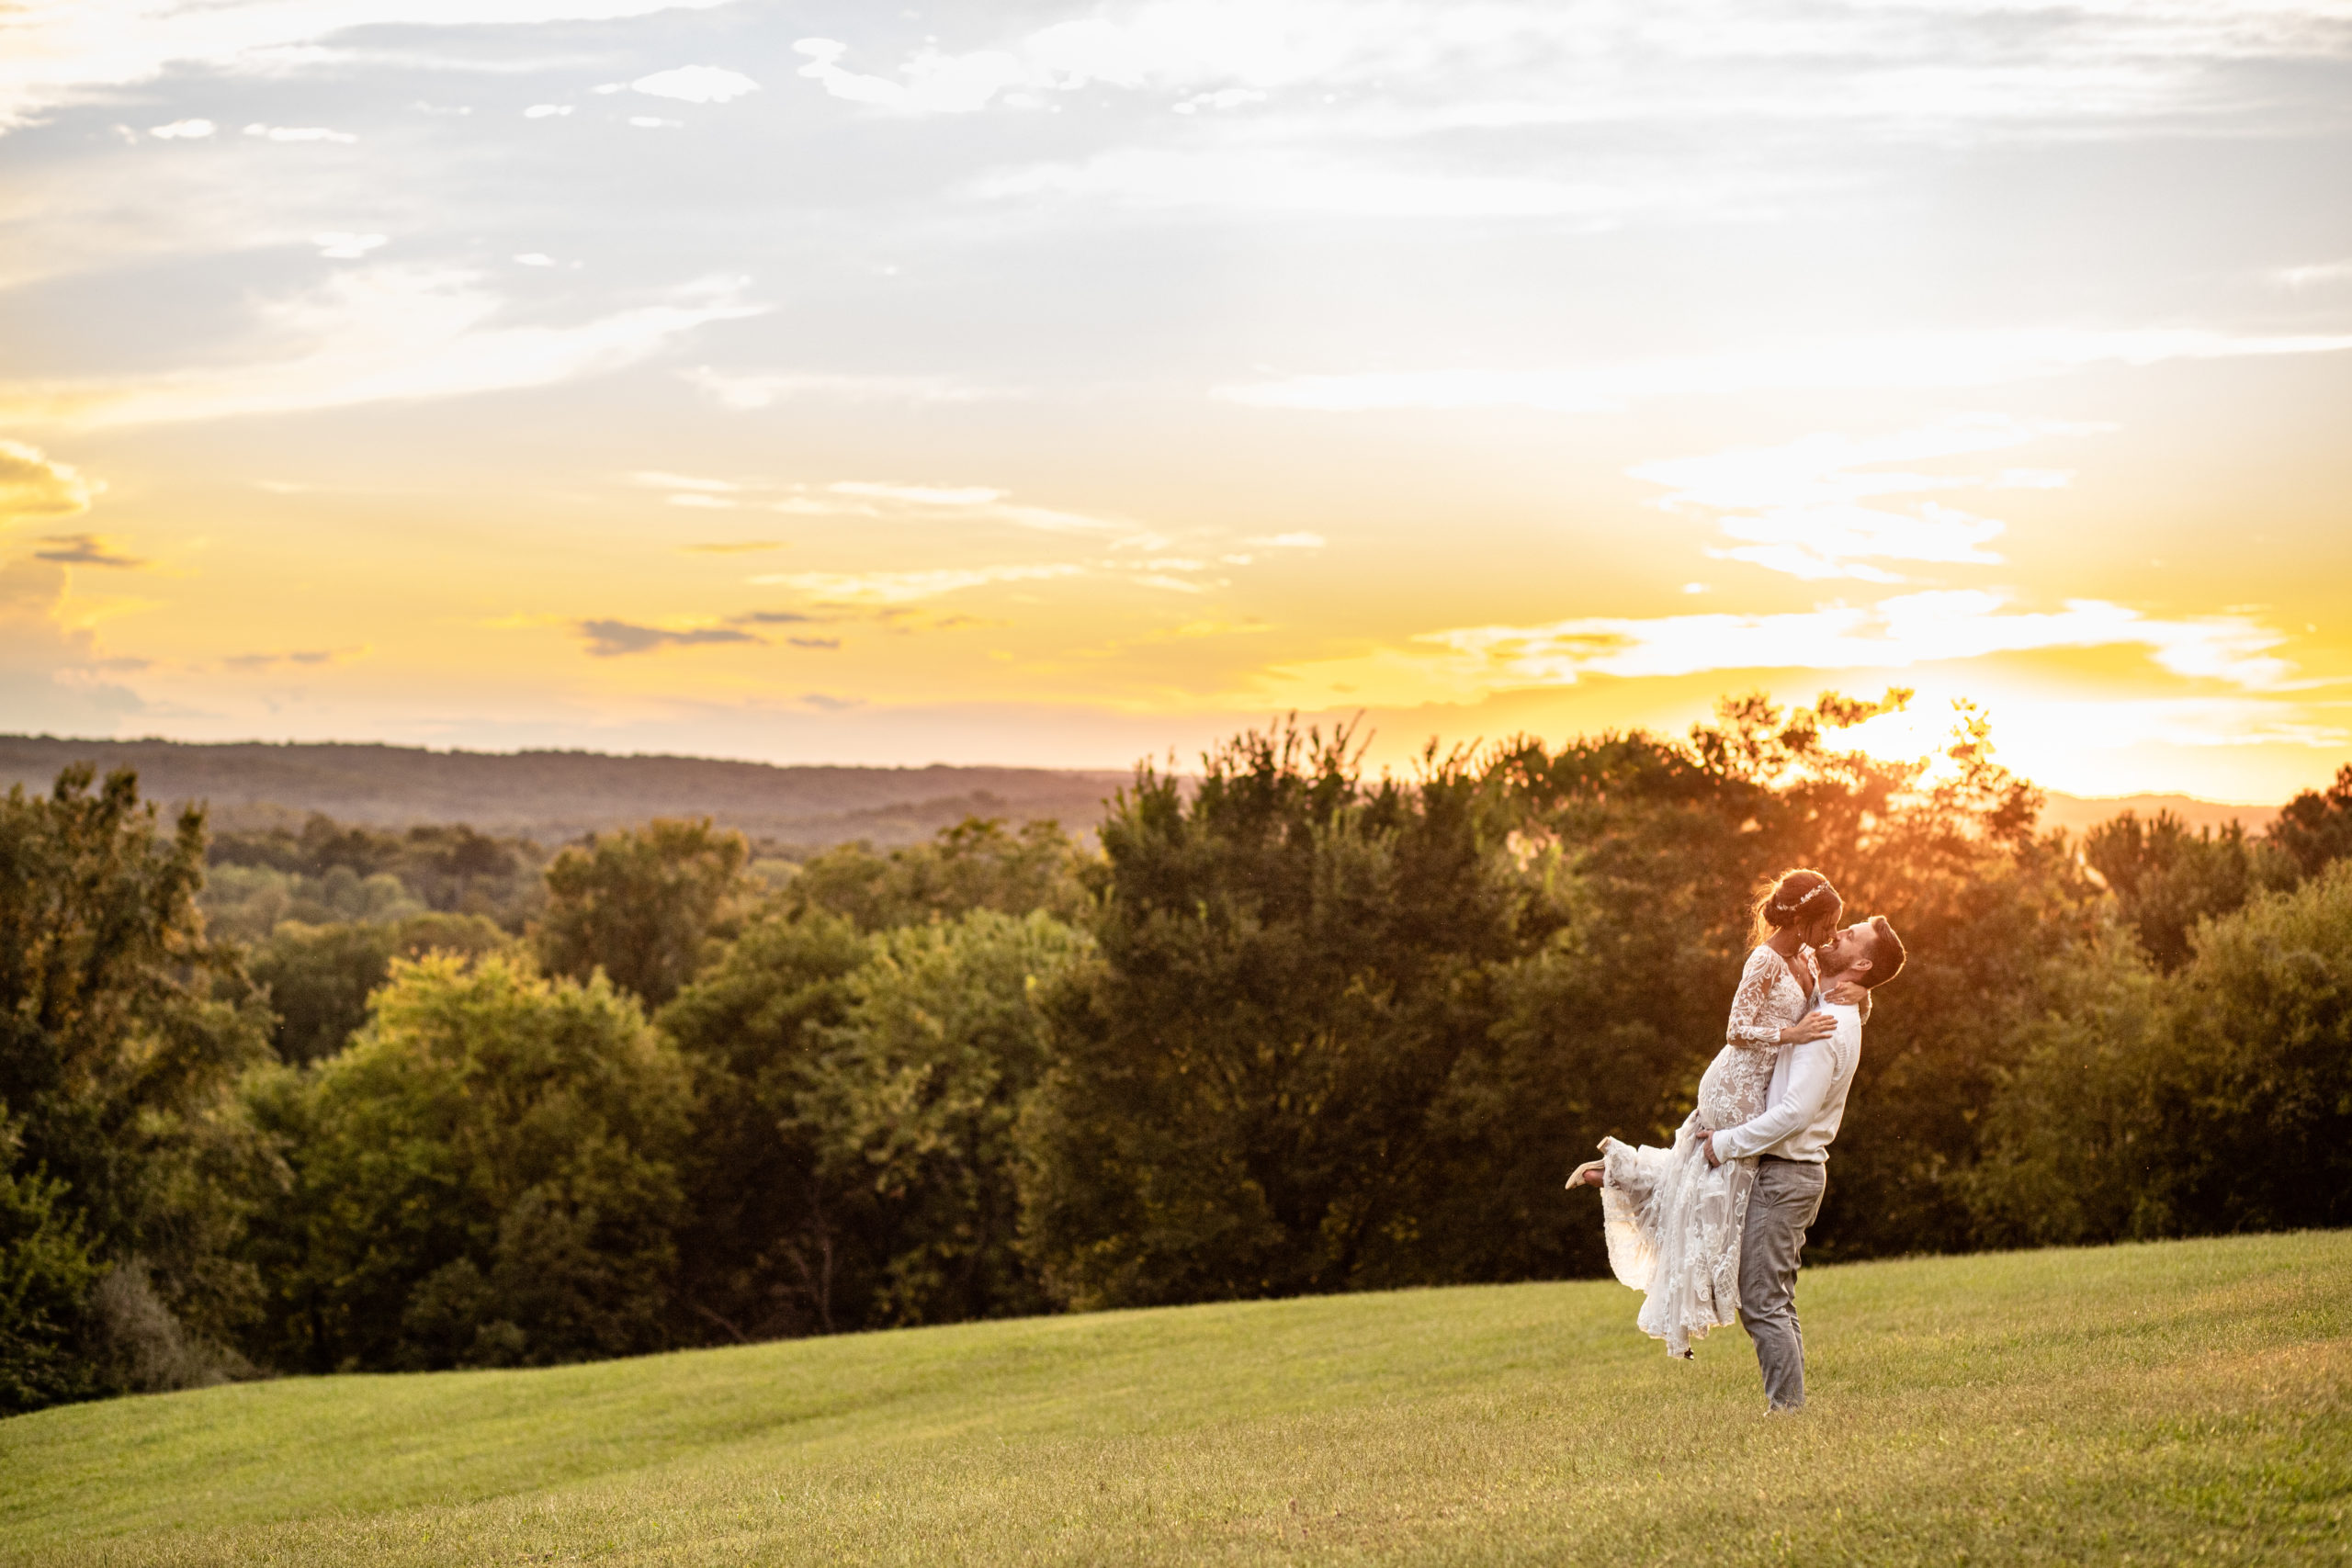 sunset wedding portrait, golden hour, wedding photography, southern illinois wedding photography